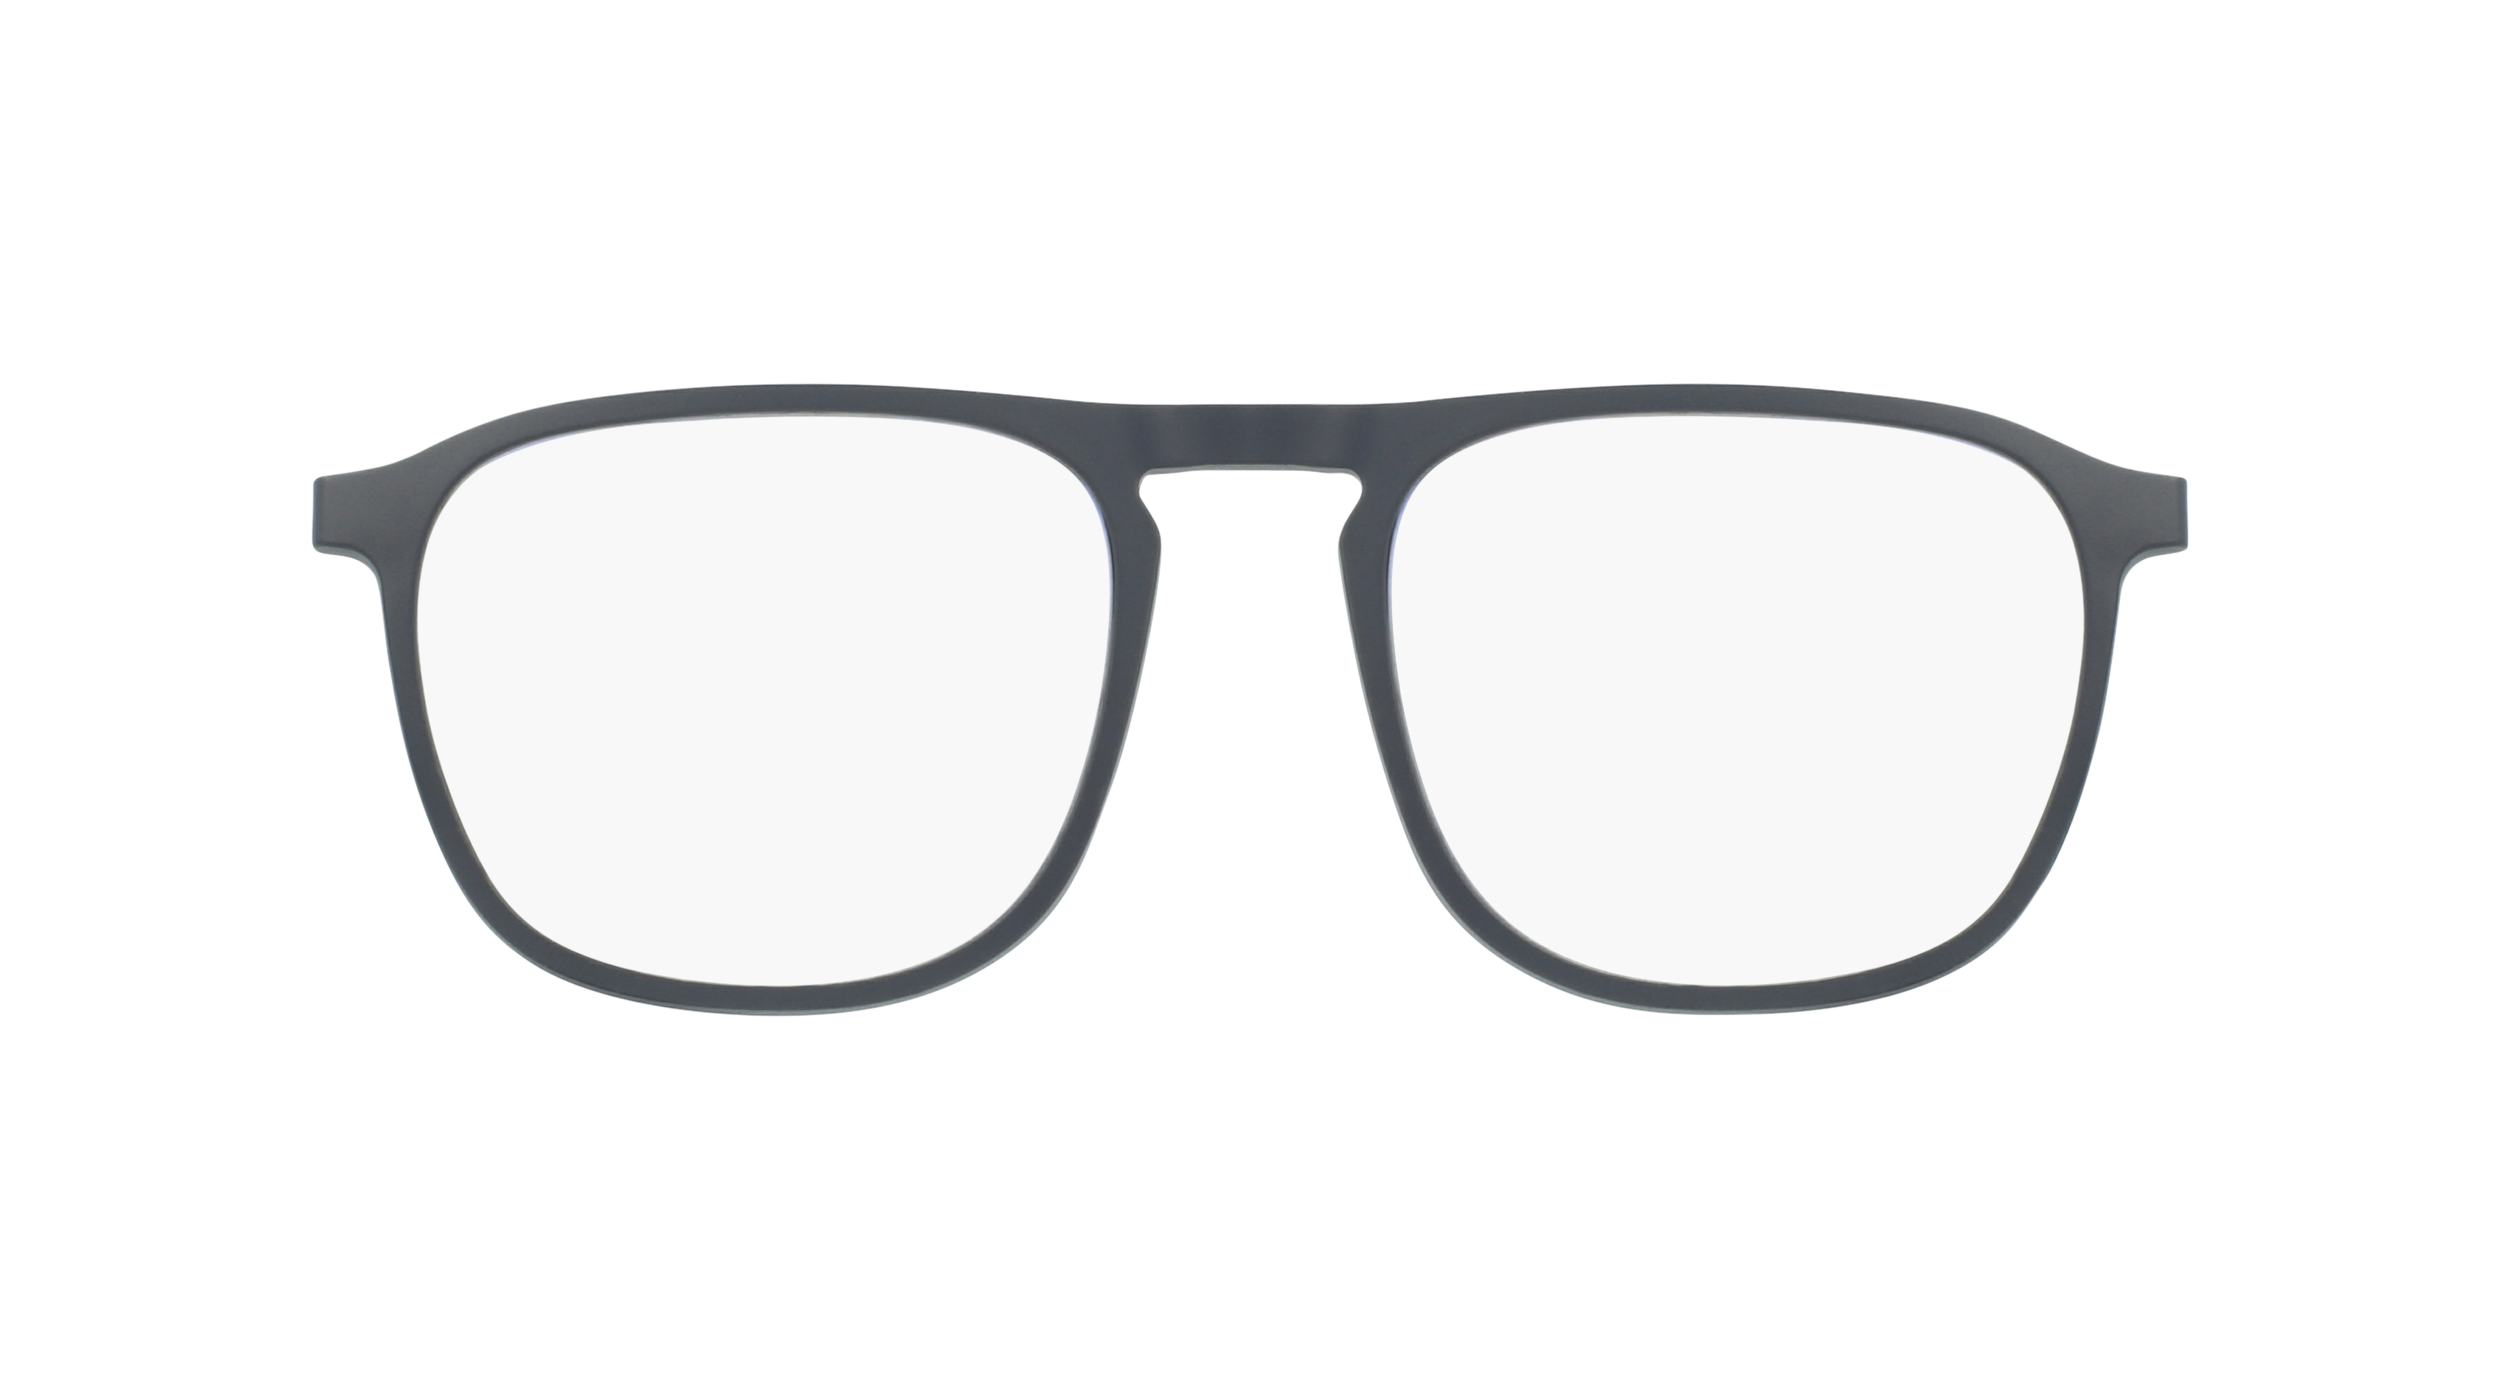 afflelou/france/products/smart_clip/clips_glasses/07630036457238.png